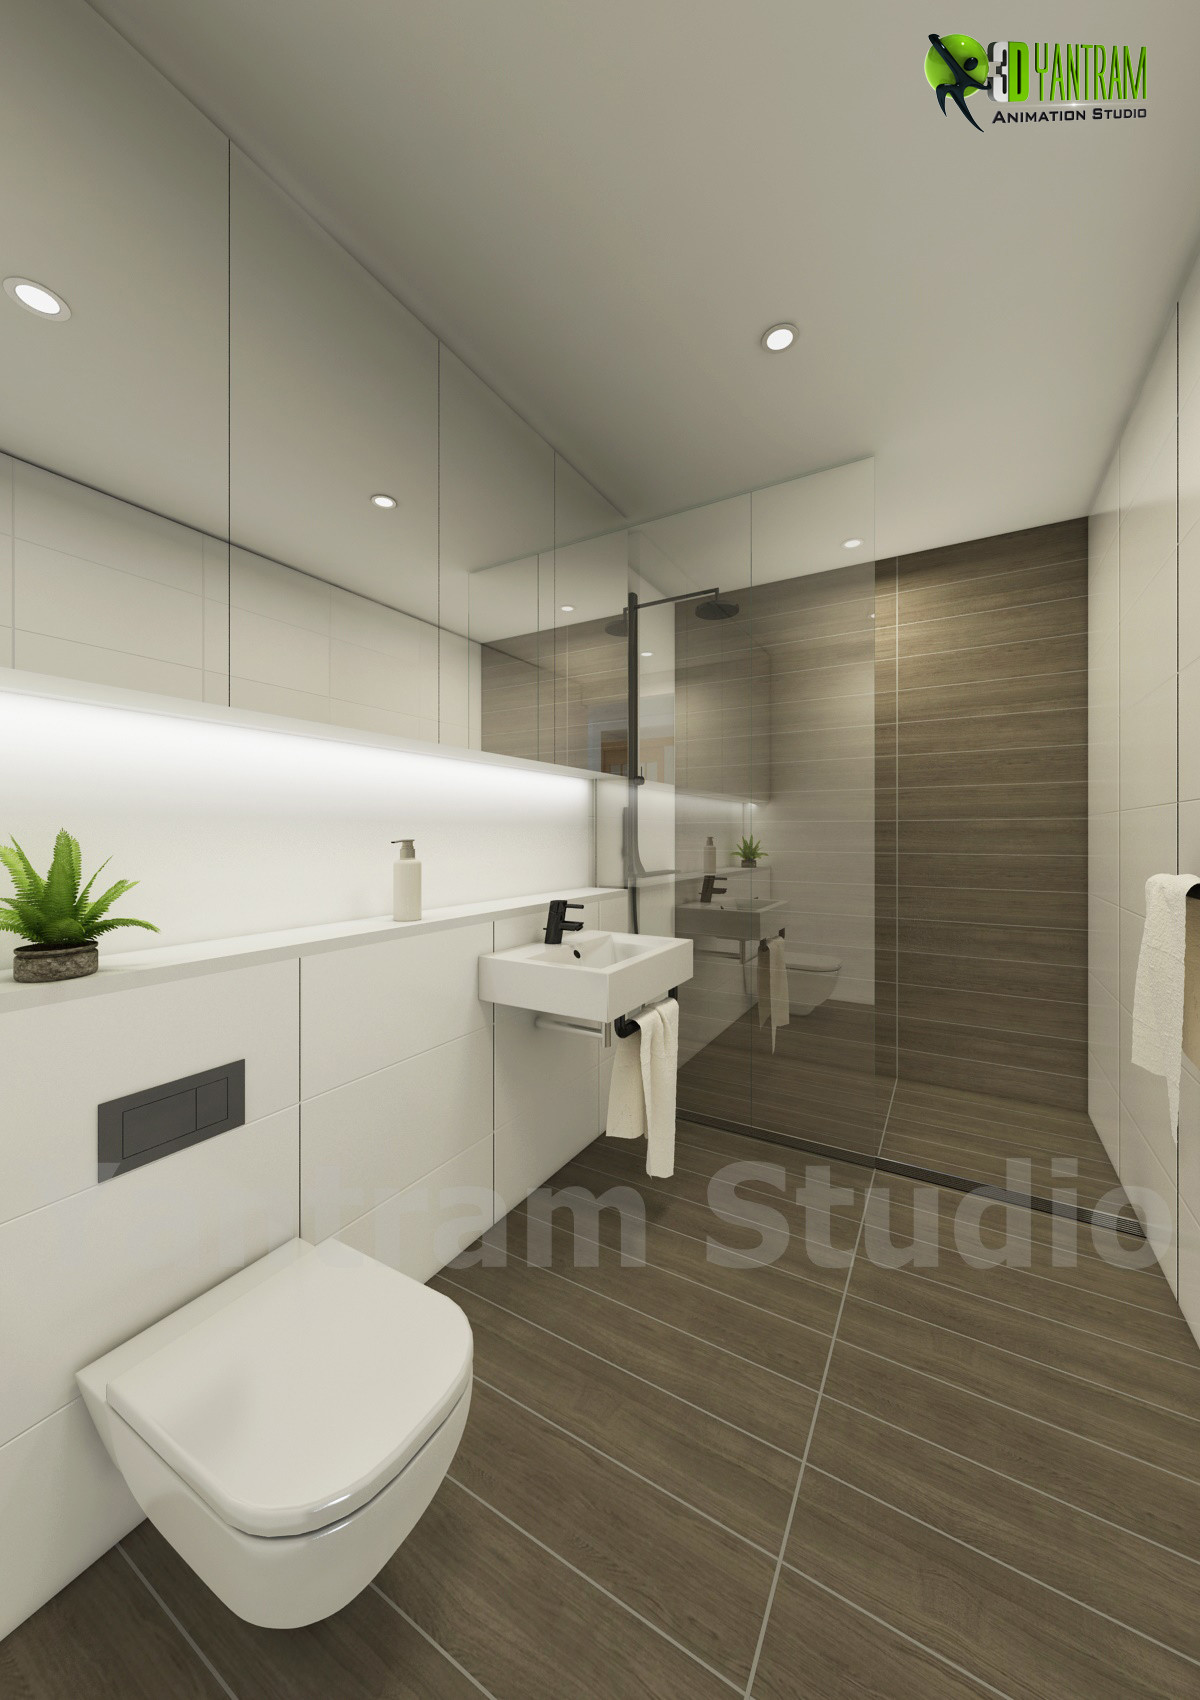 Artstation 3d Modern Bathroom Interior Design Mexico Yantram Architectural Design Studio